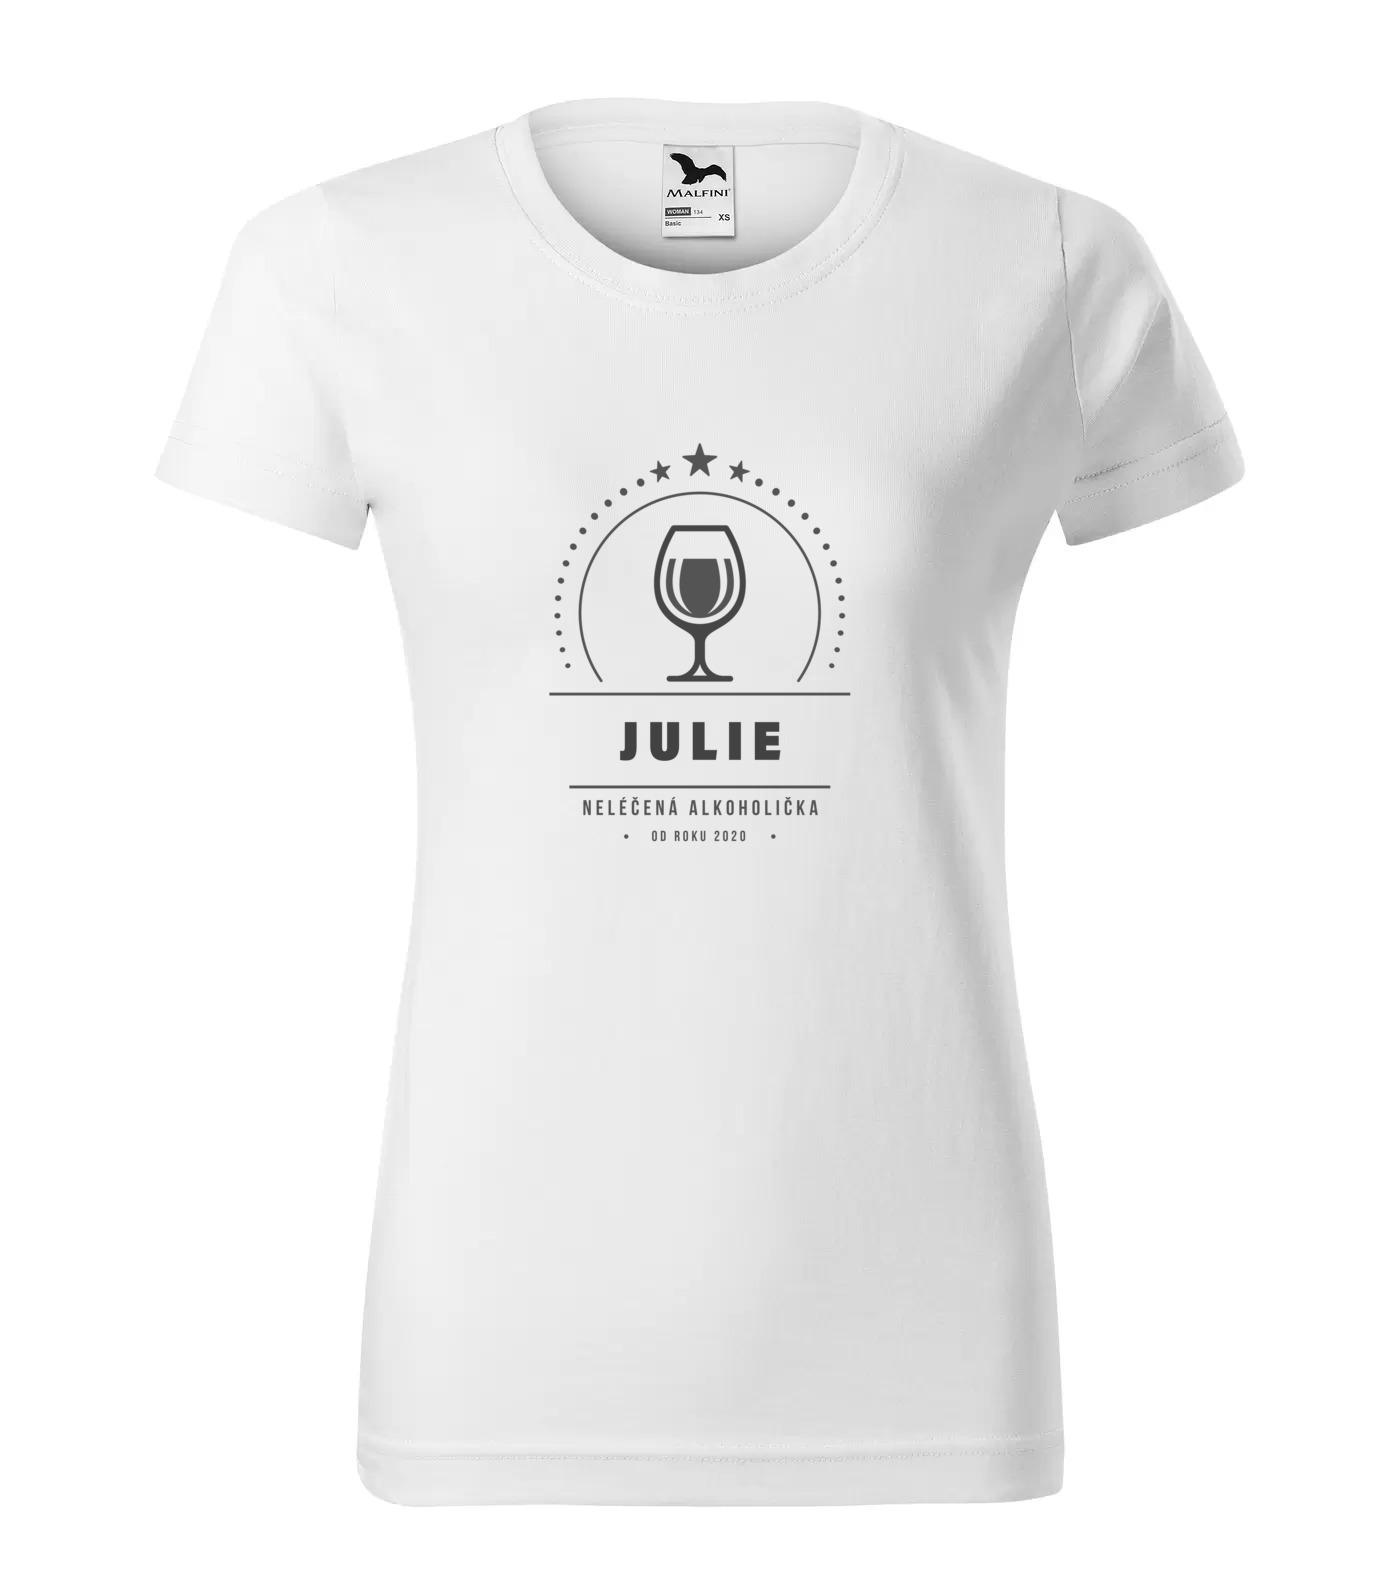 Tričko Alkoholička Julie